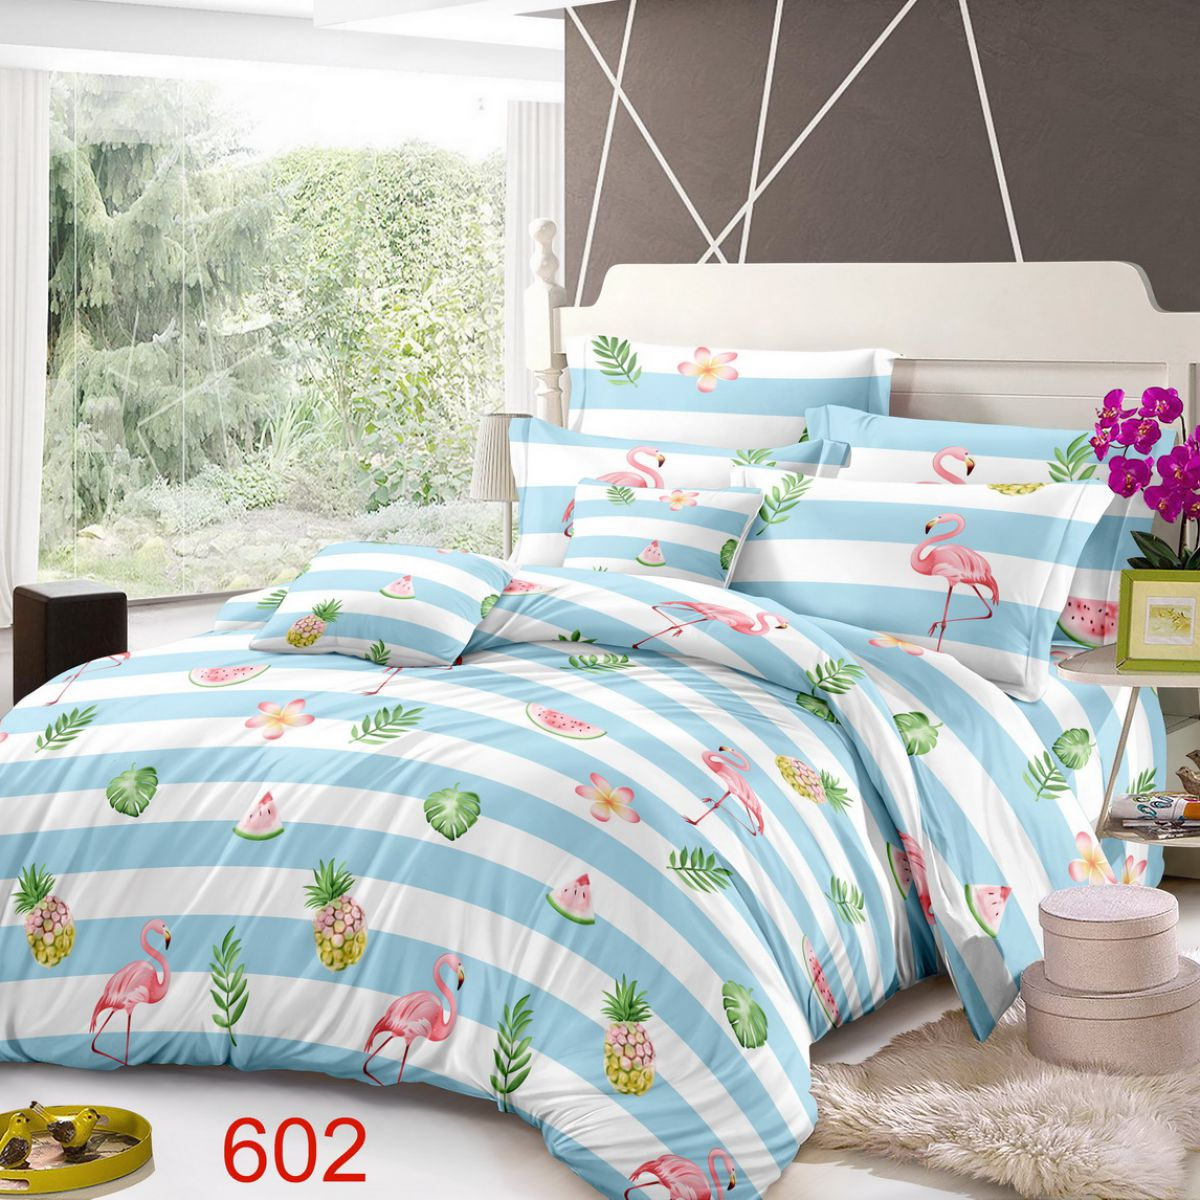 3D Beddings - Antonio - AML-4232 - 160x200 cm - 4 pcs